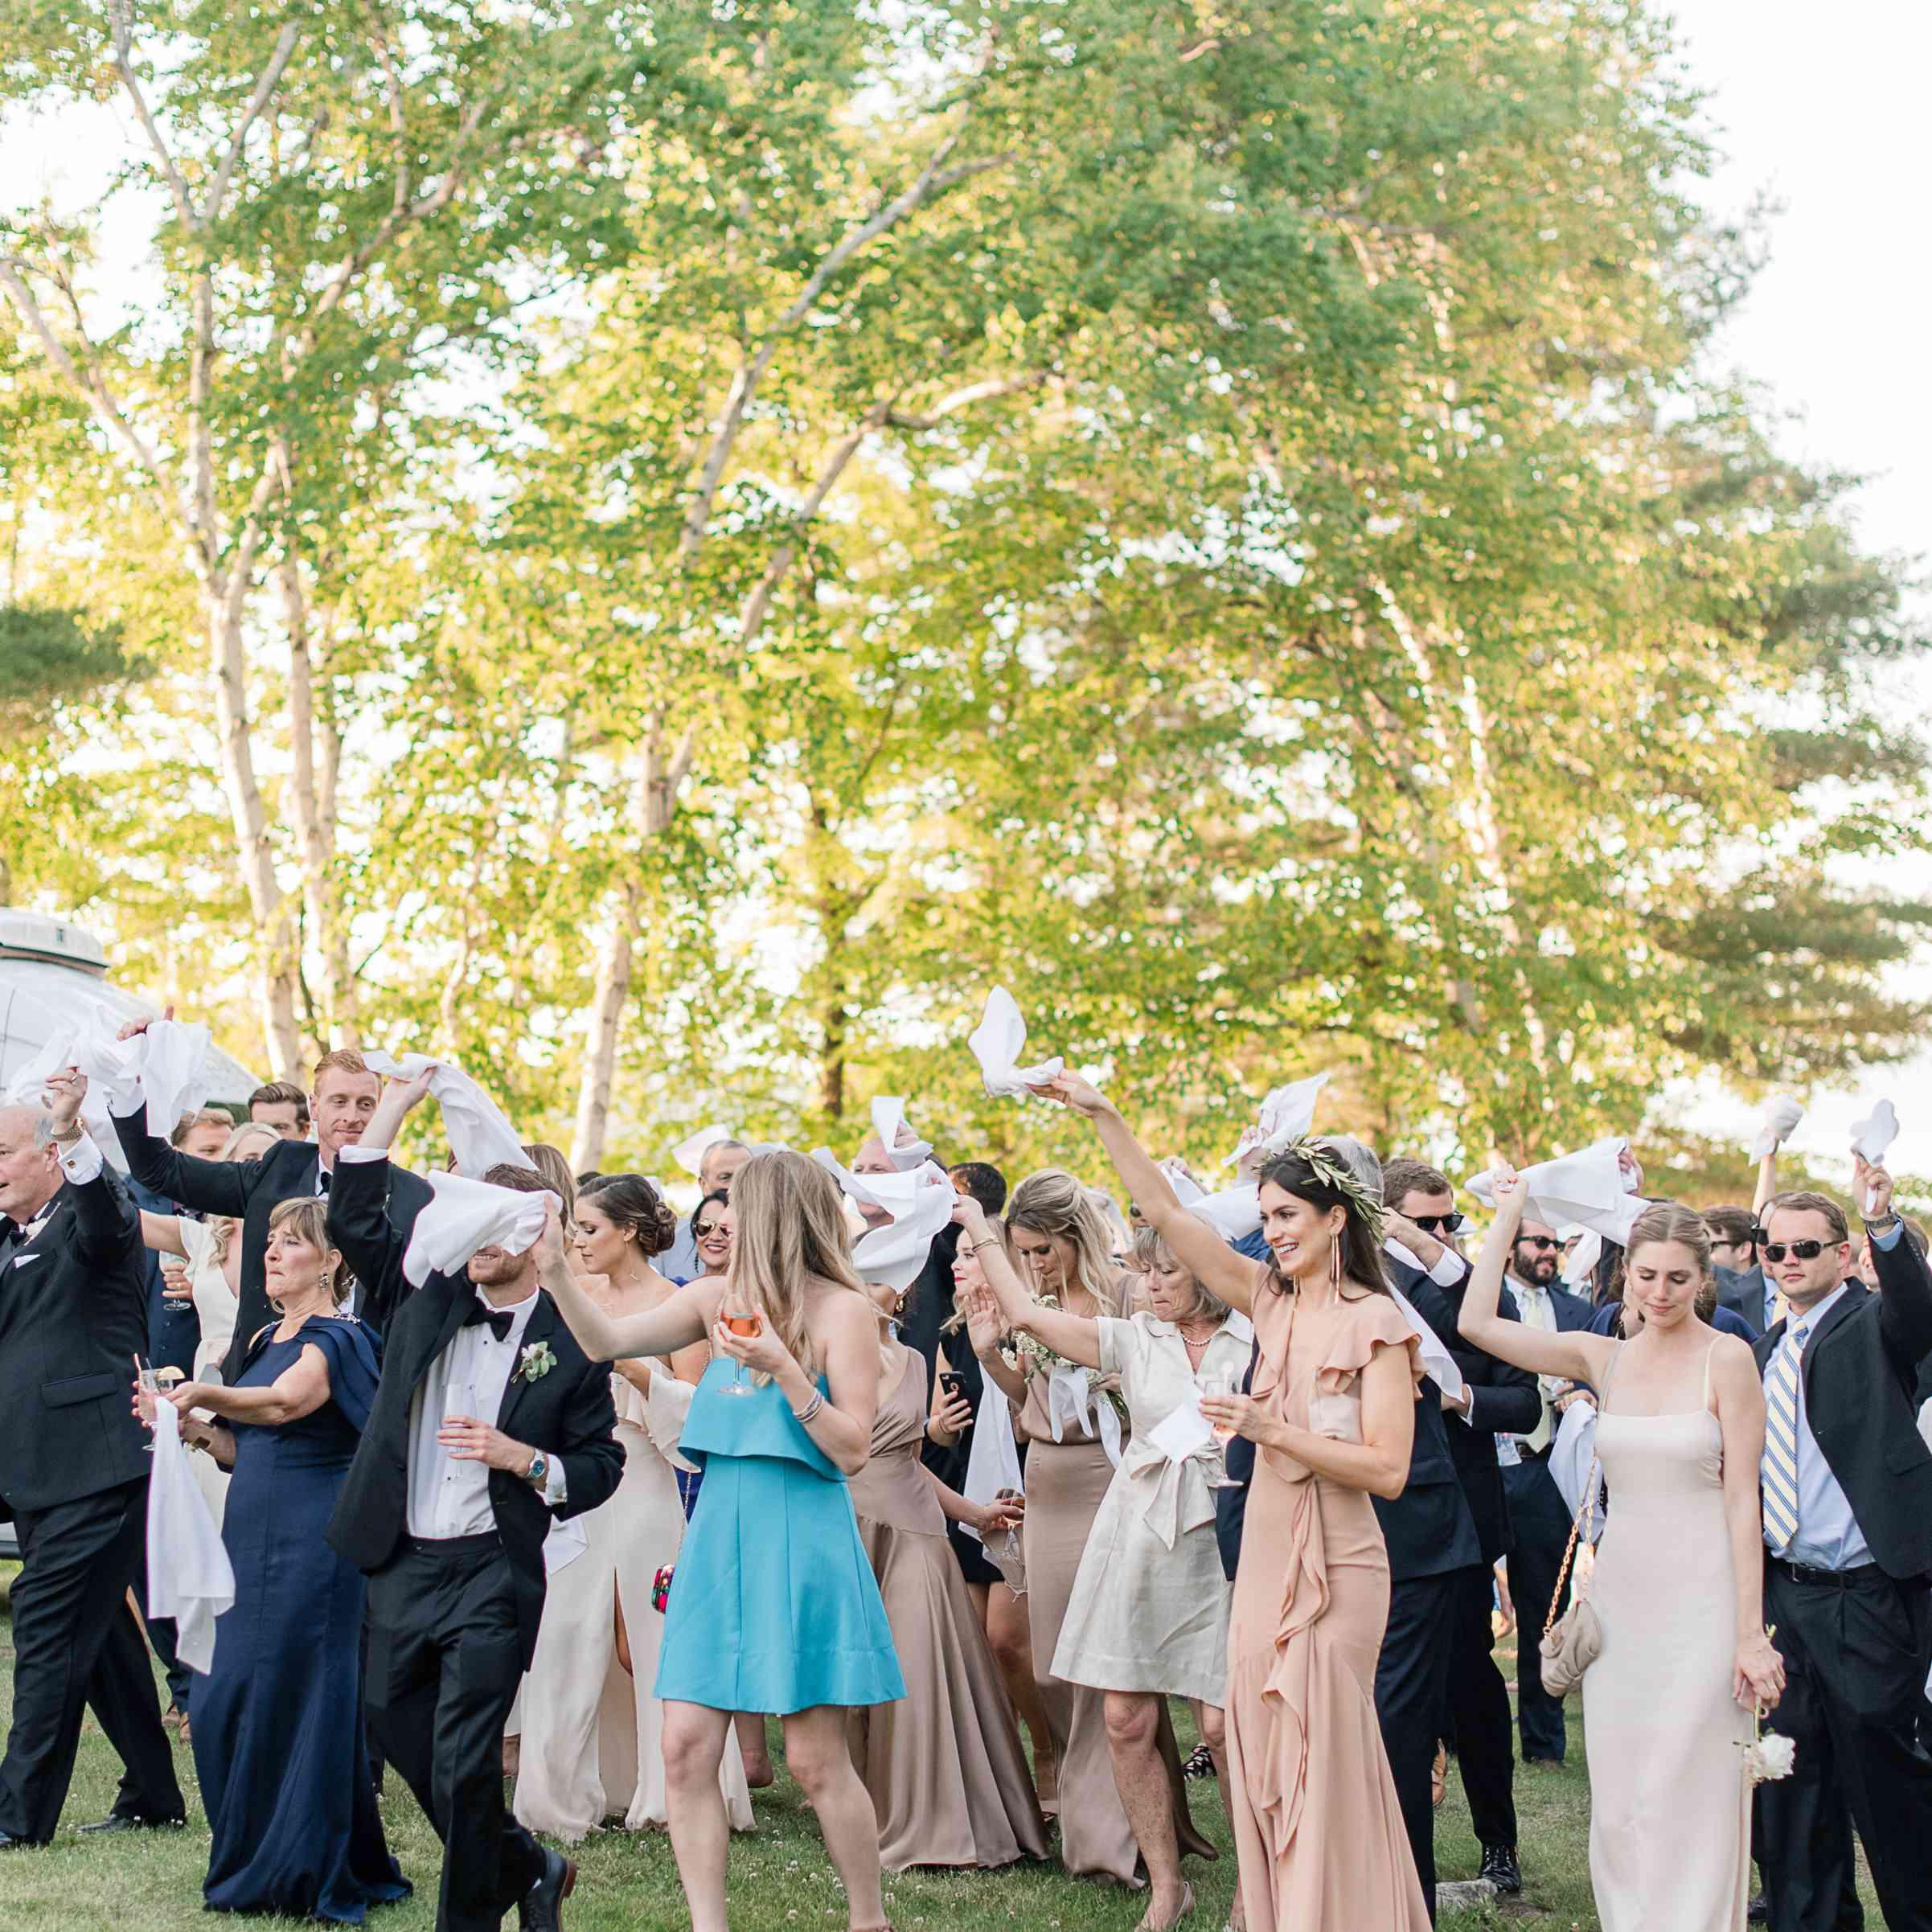 <p>Wedding party with handkerchiefs</p><br><br>